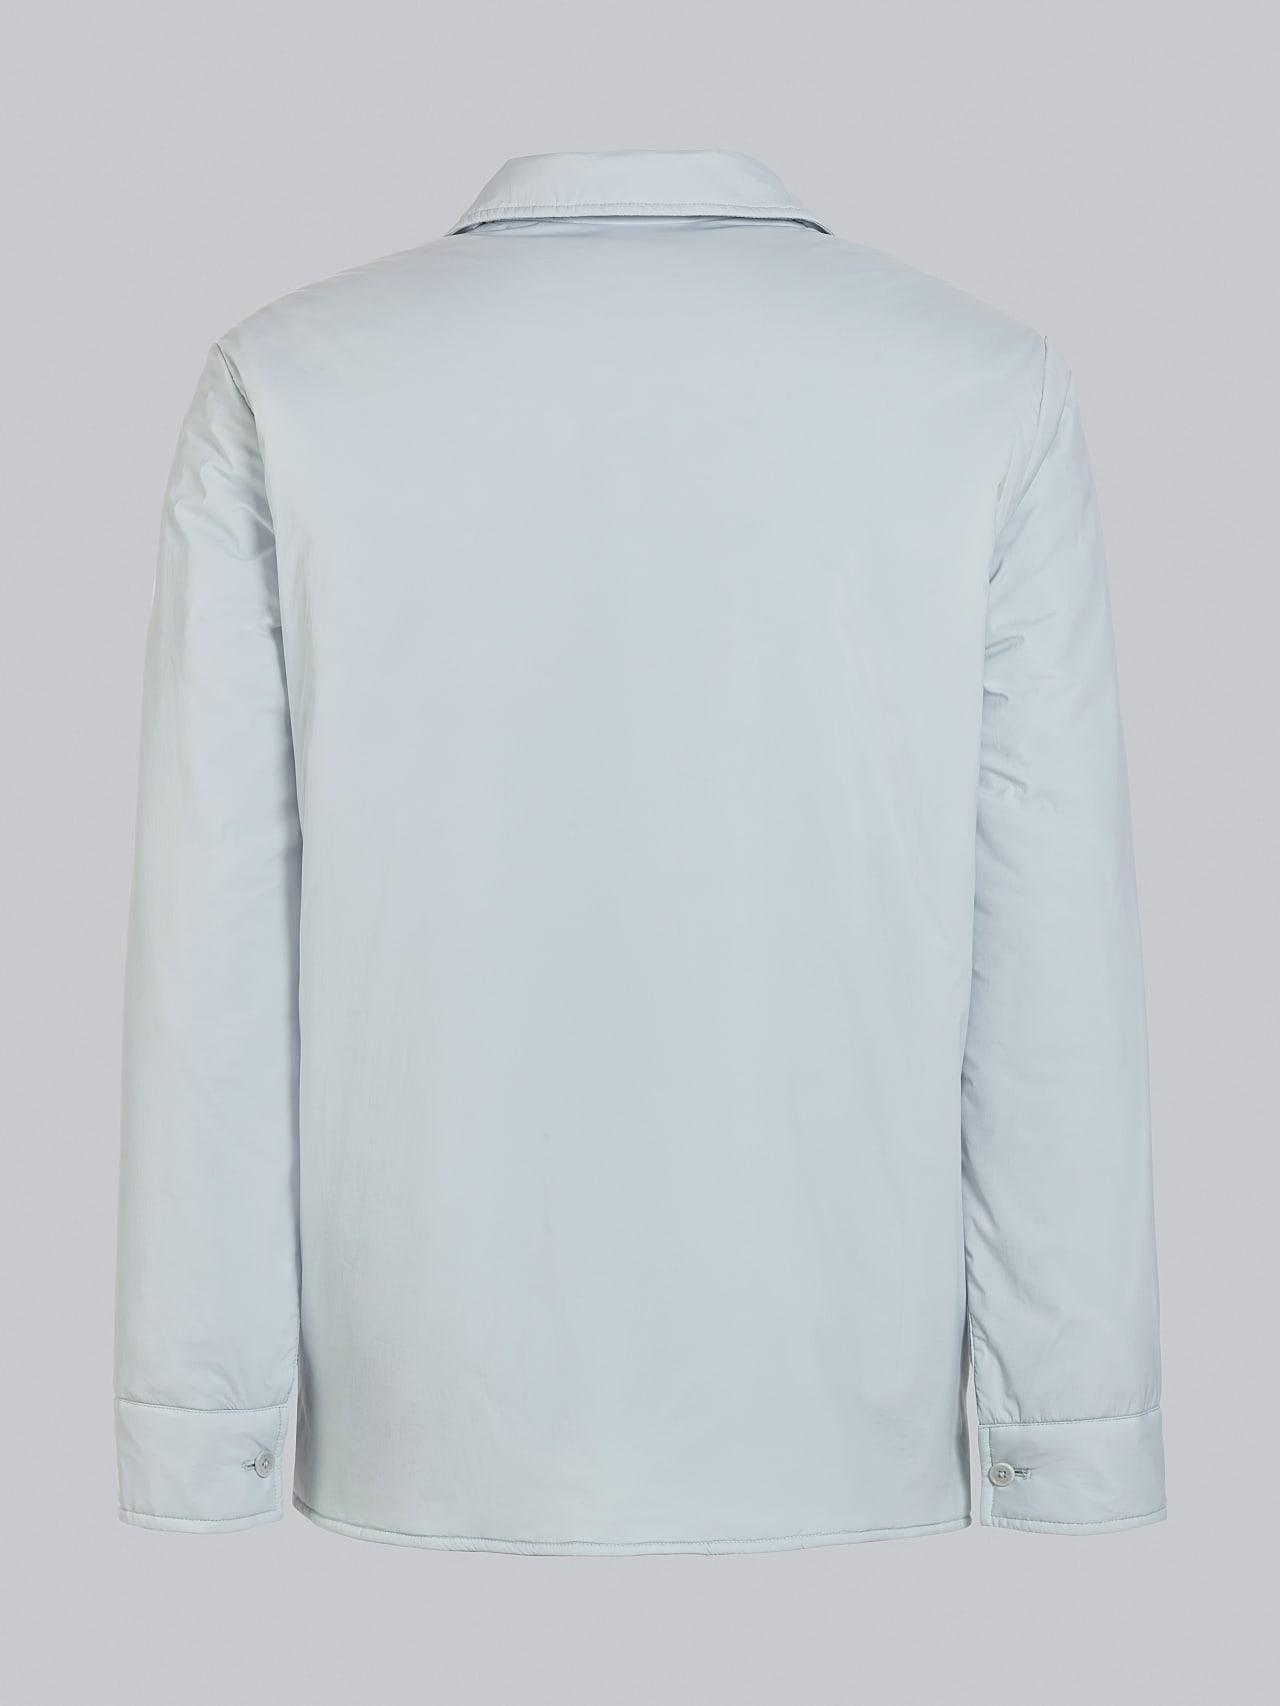 OVASU V1.Y5.02 PrimaLoft® Overshirt Jacket Pale Blue  Left Alpha Tauri